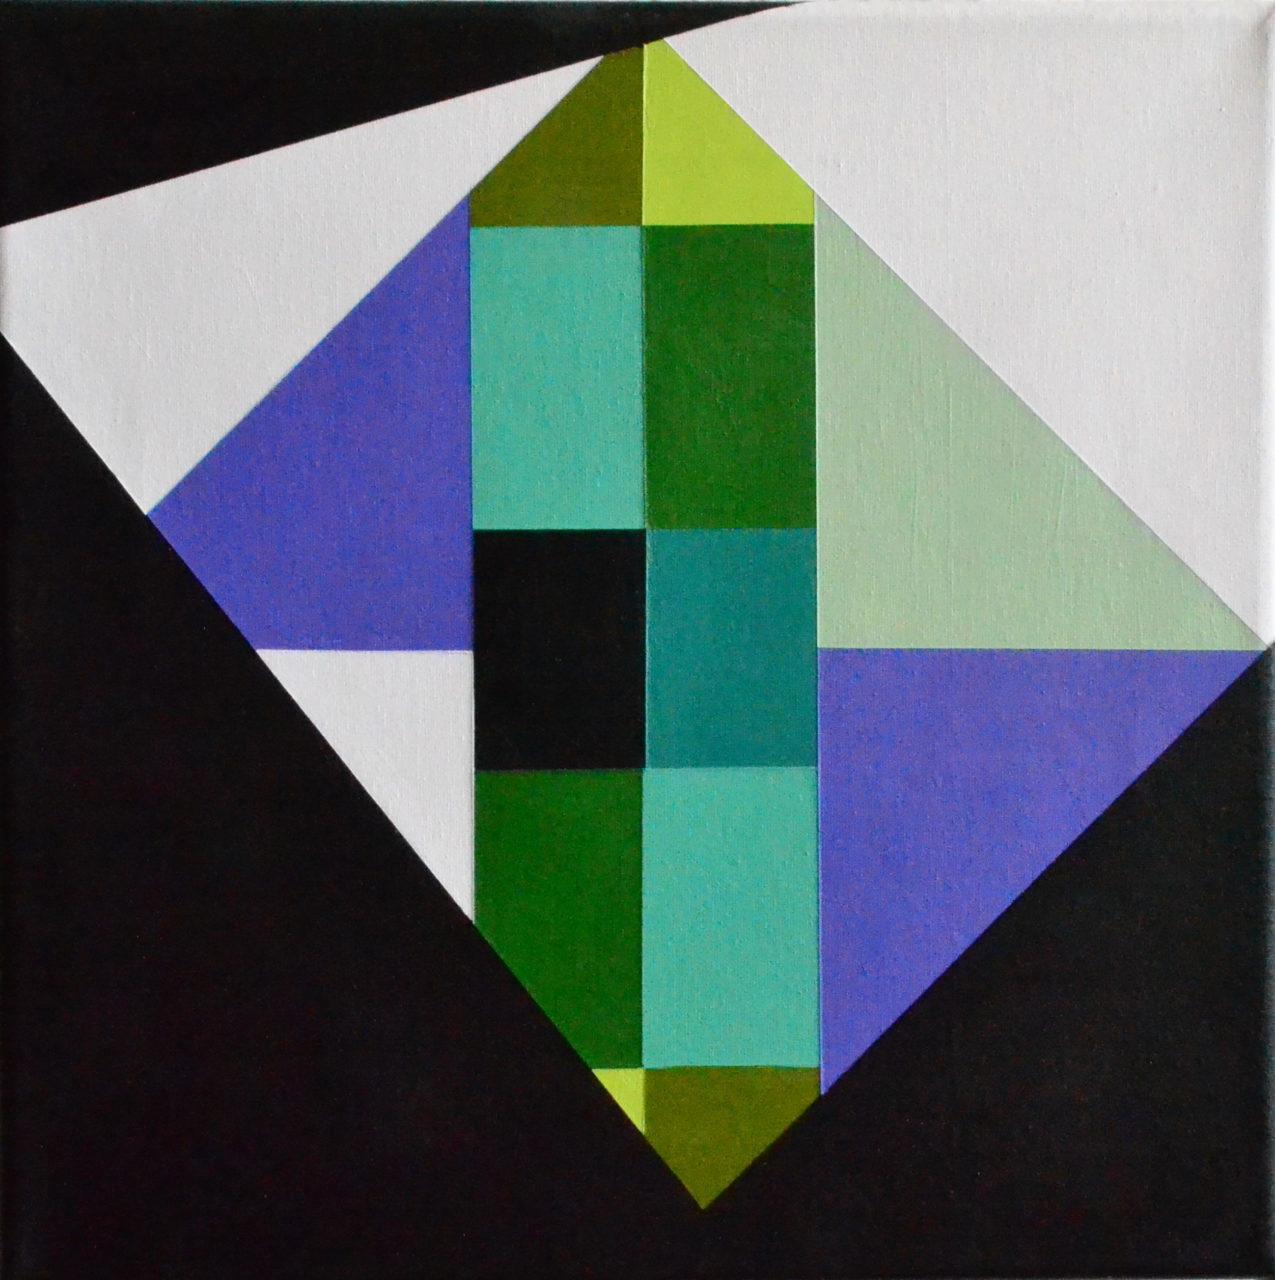 Asymetric Cubes #1 1